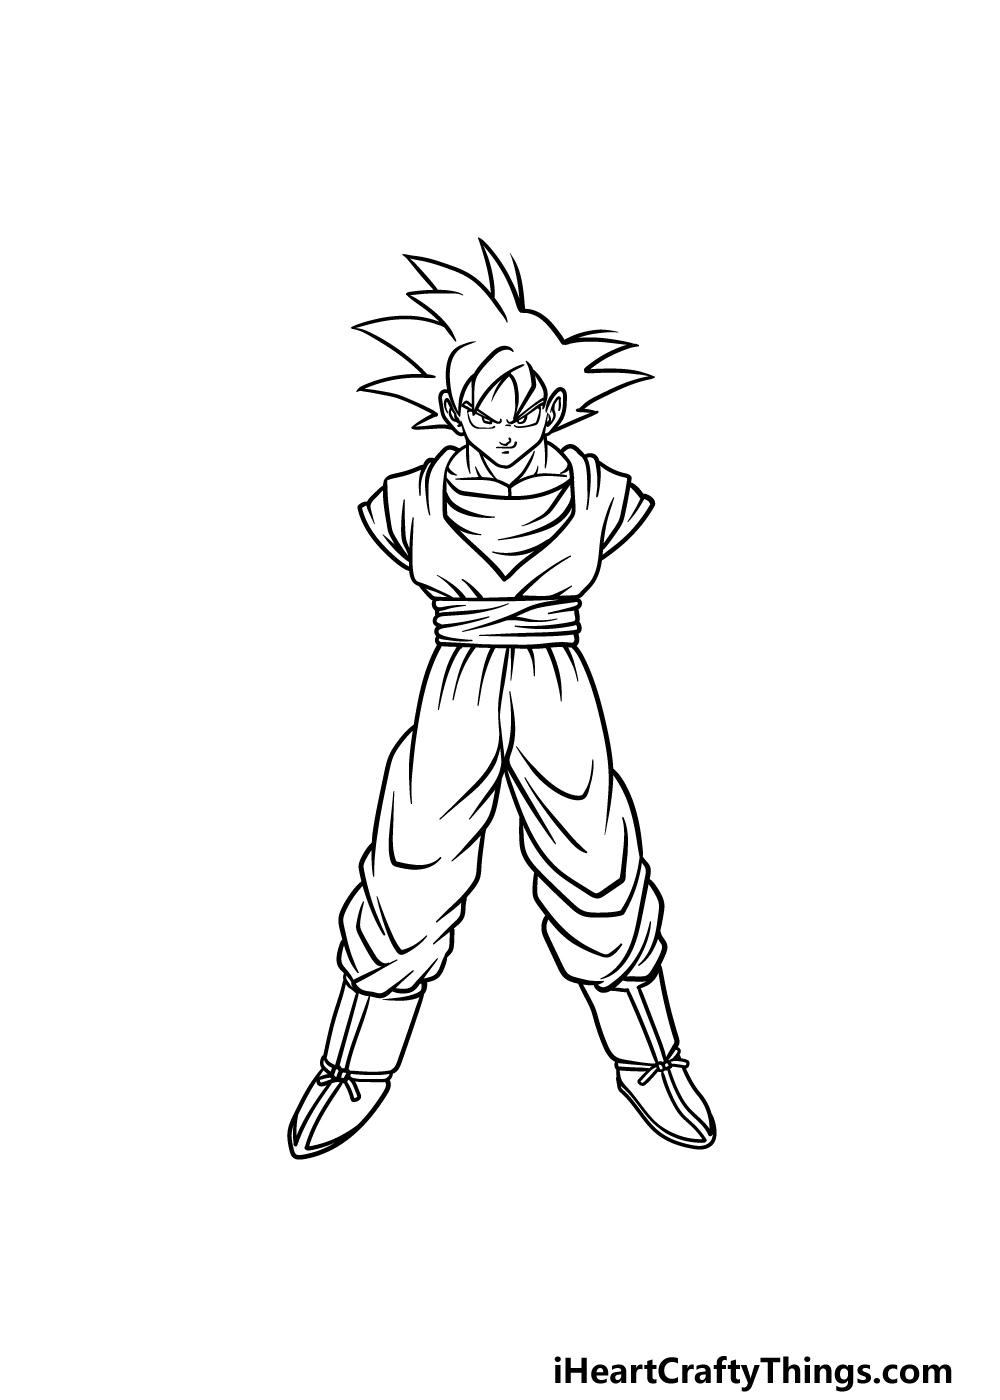 drawing Goku step 4